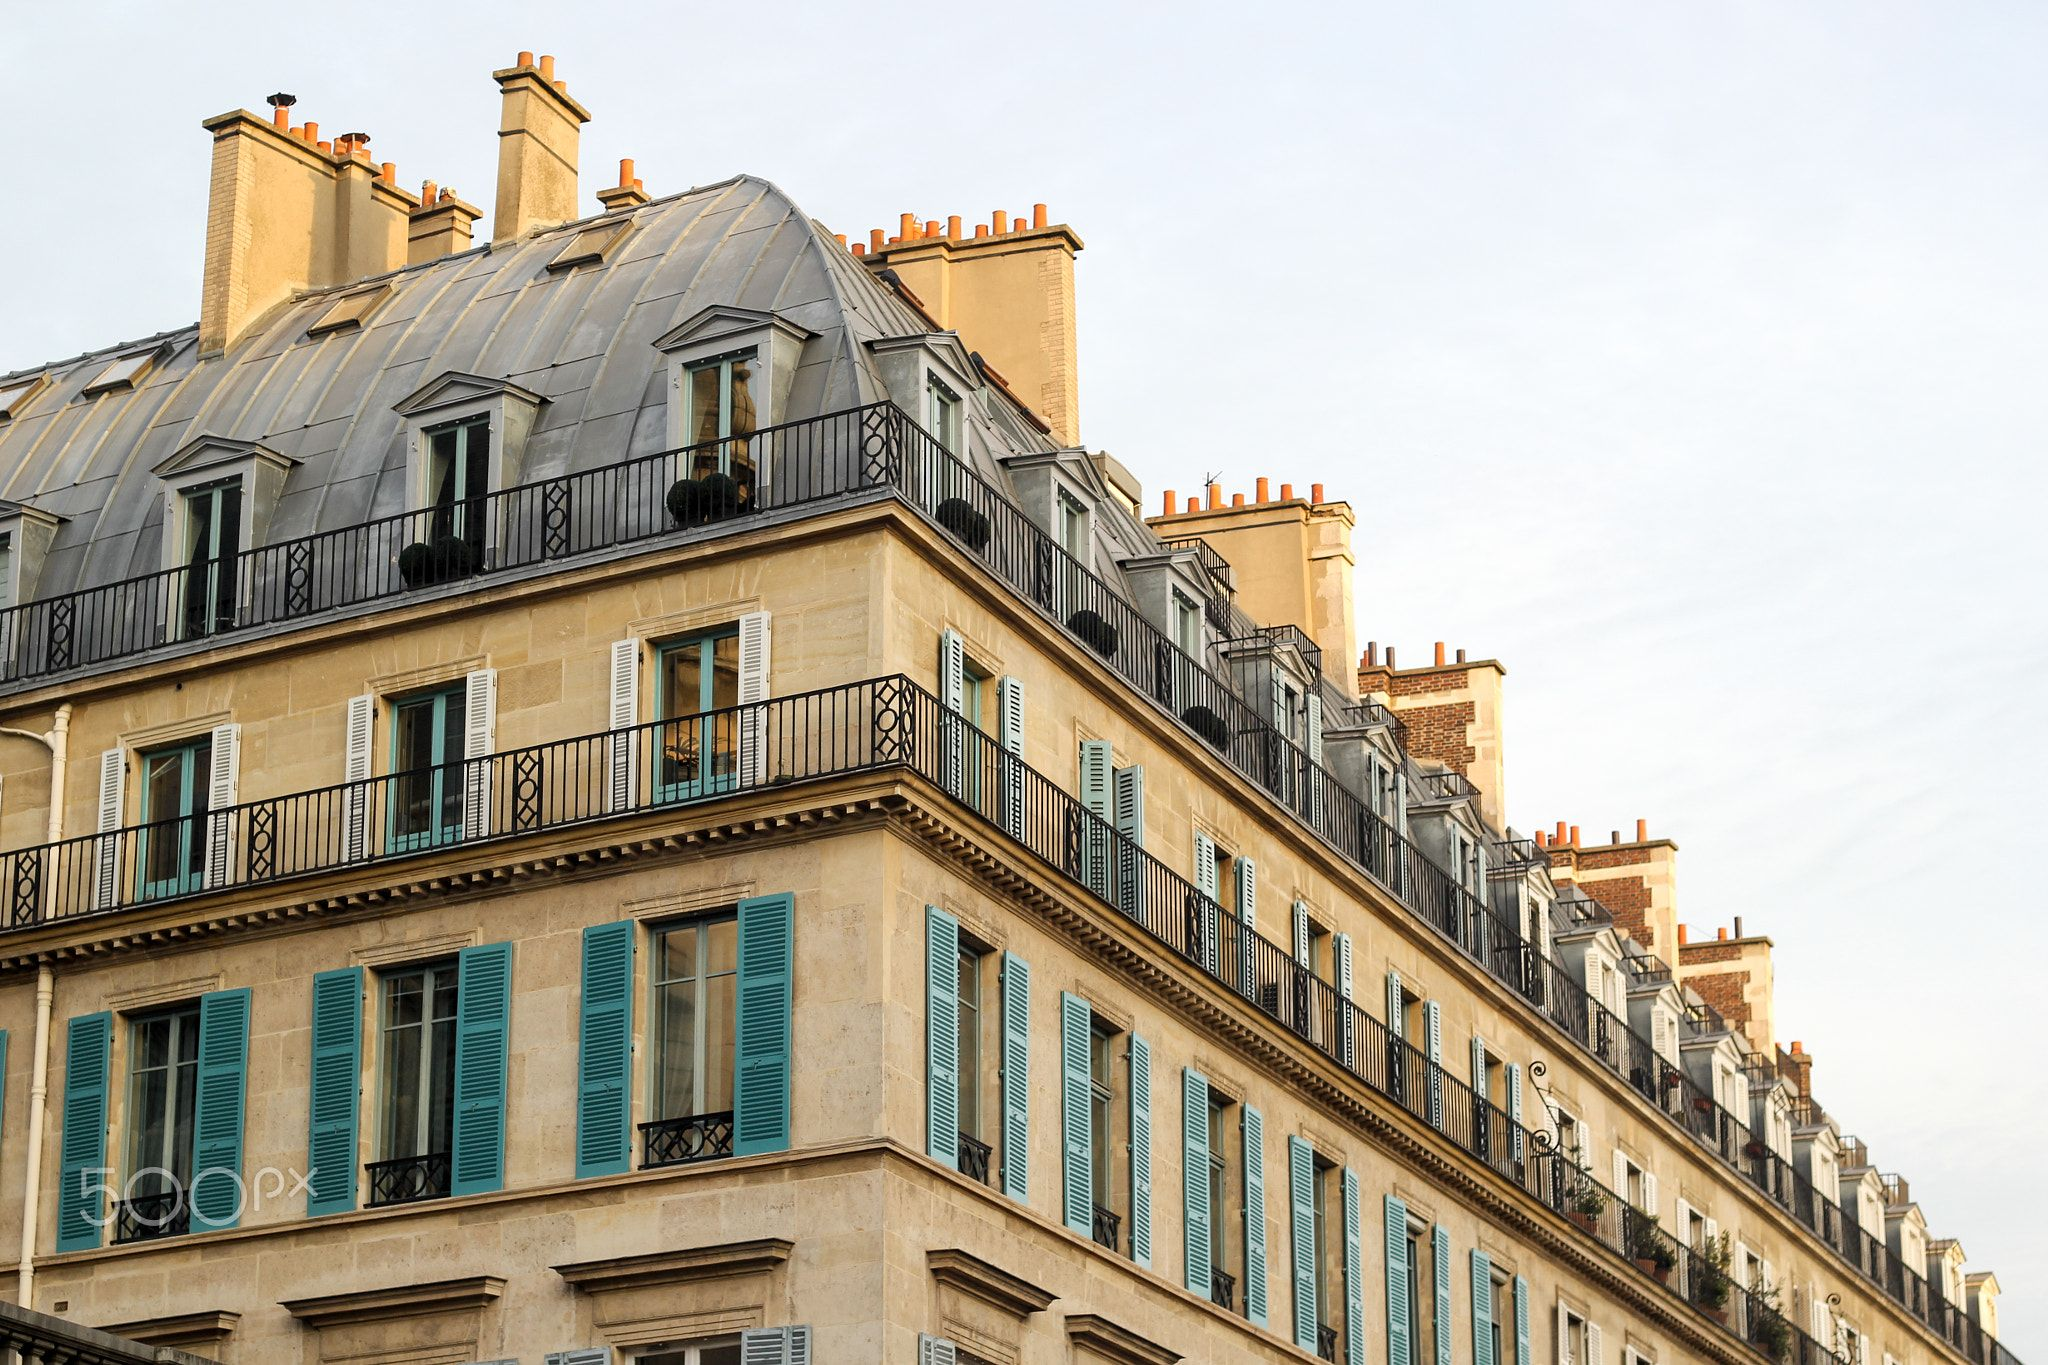 Houses of Paris